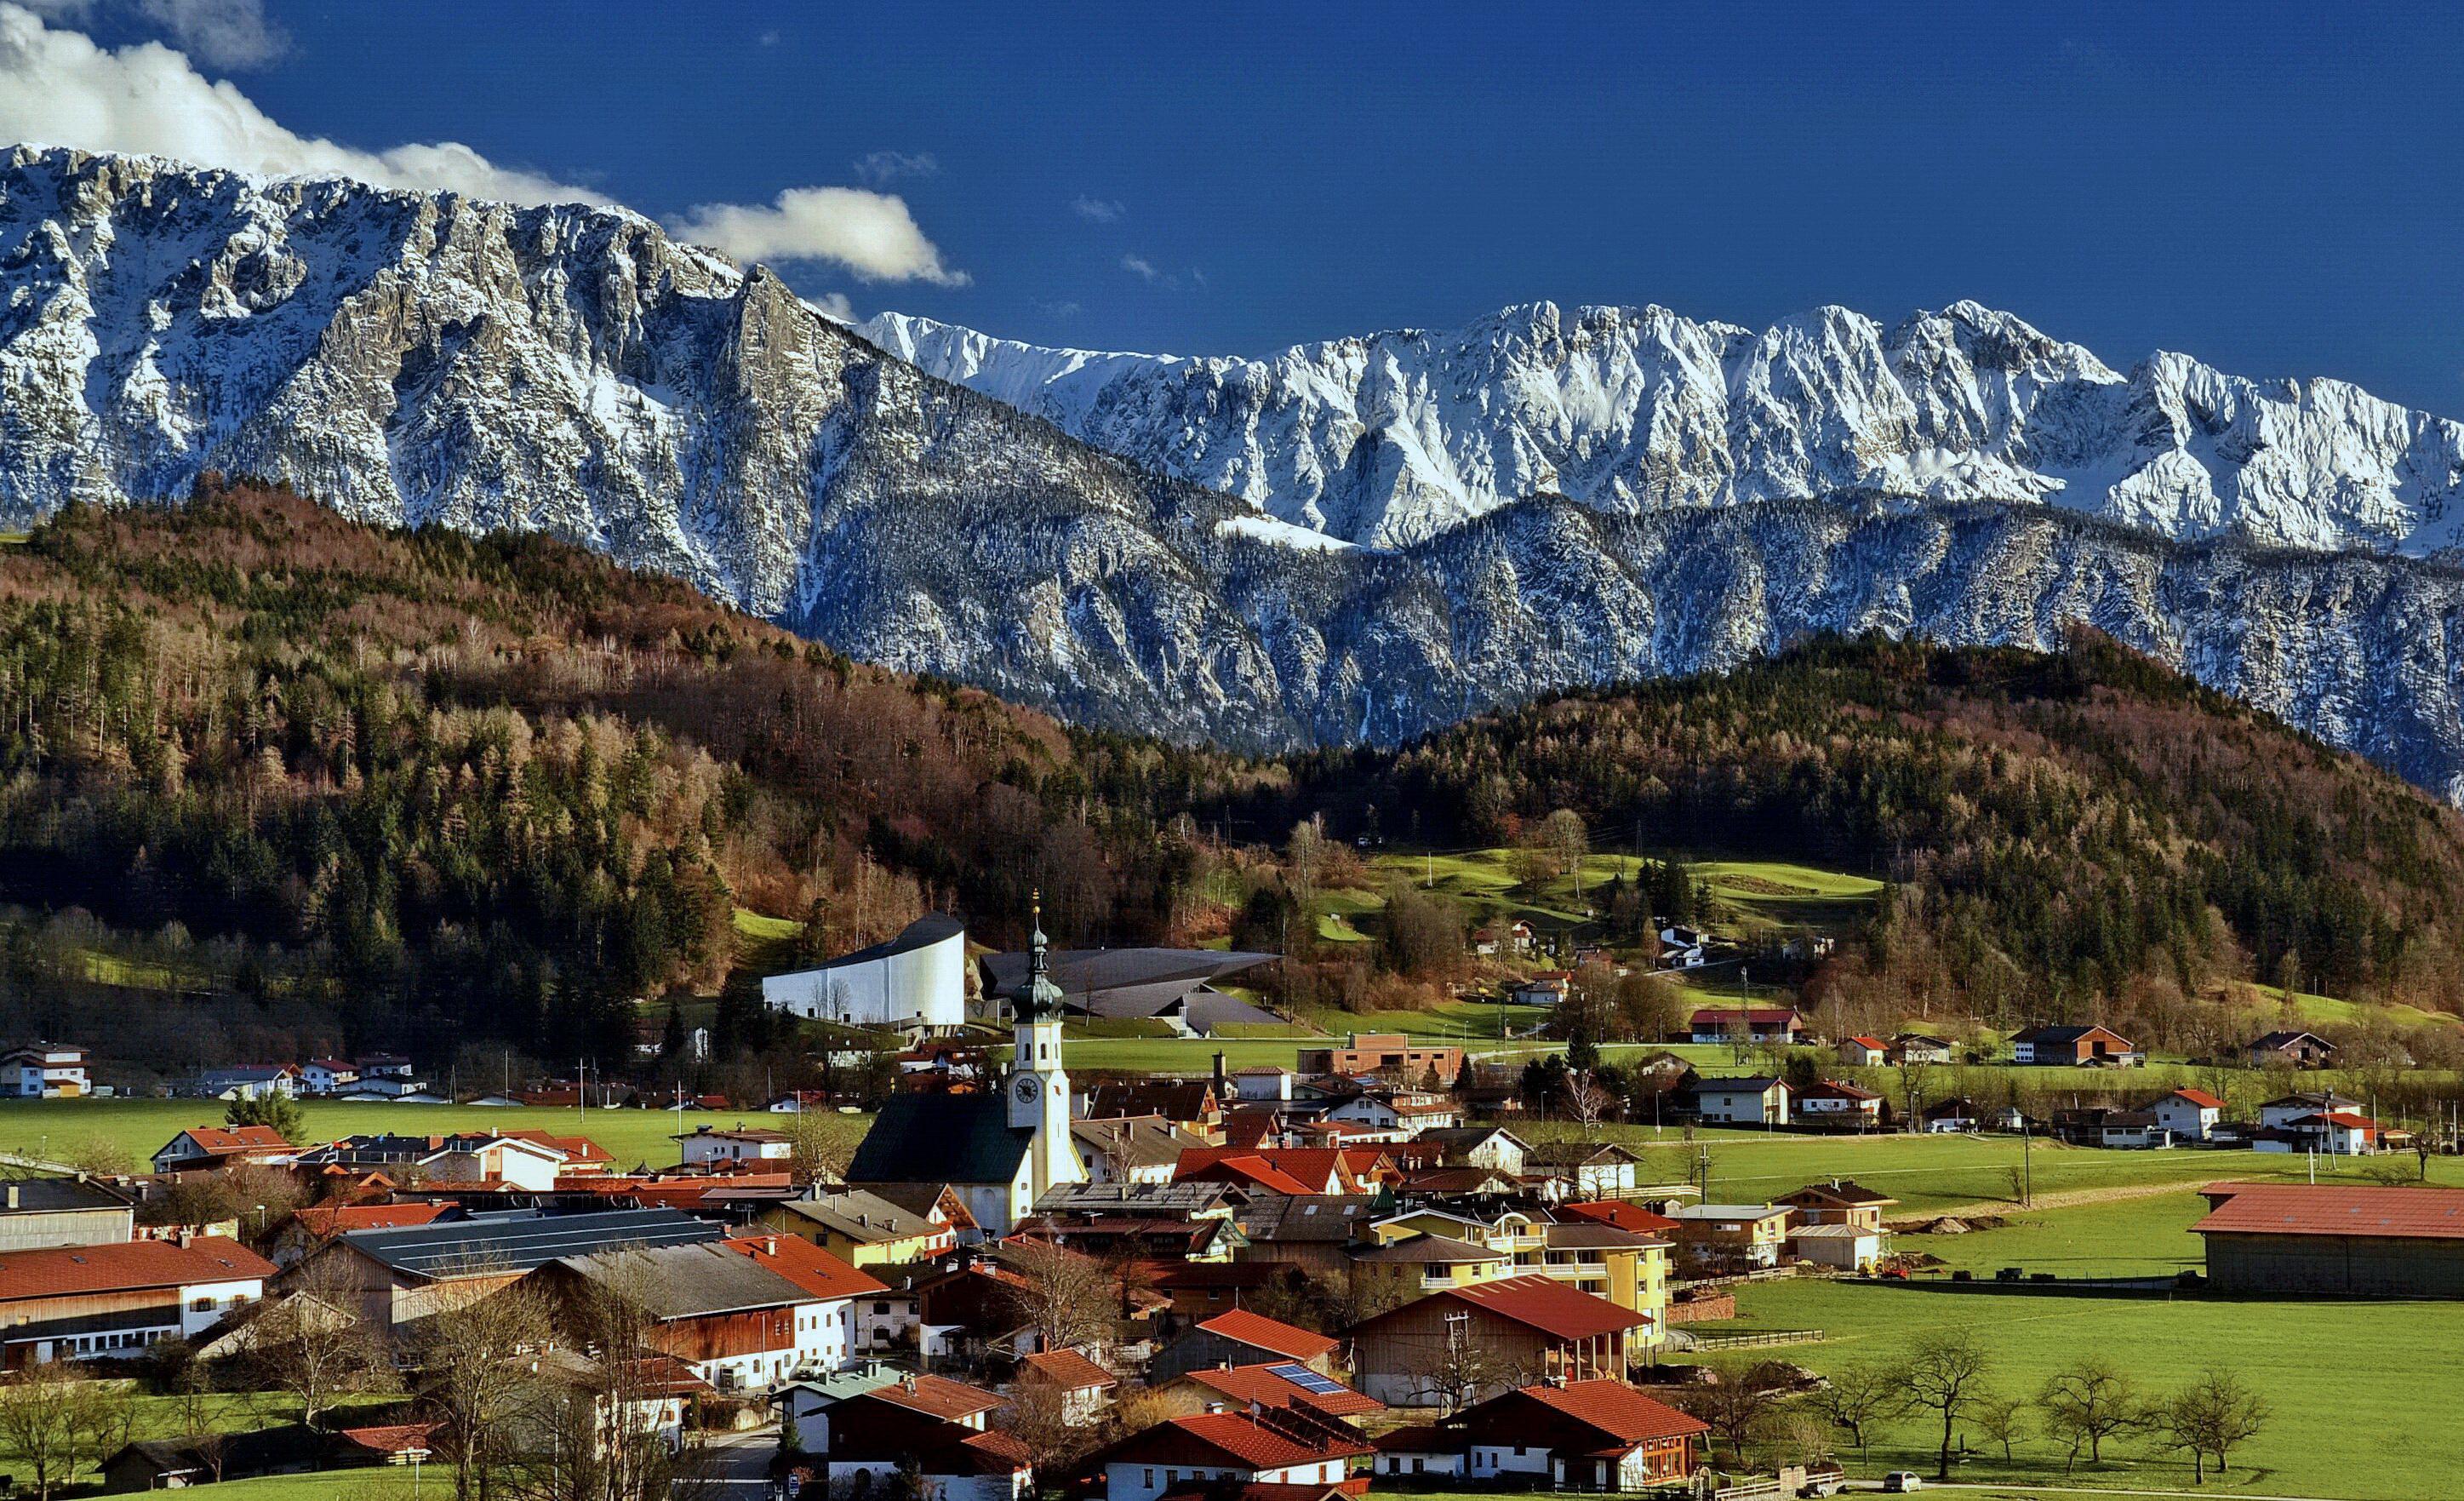 Erl_in_Tirol_Foto_Peter_Kitzbichler